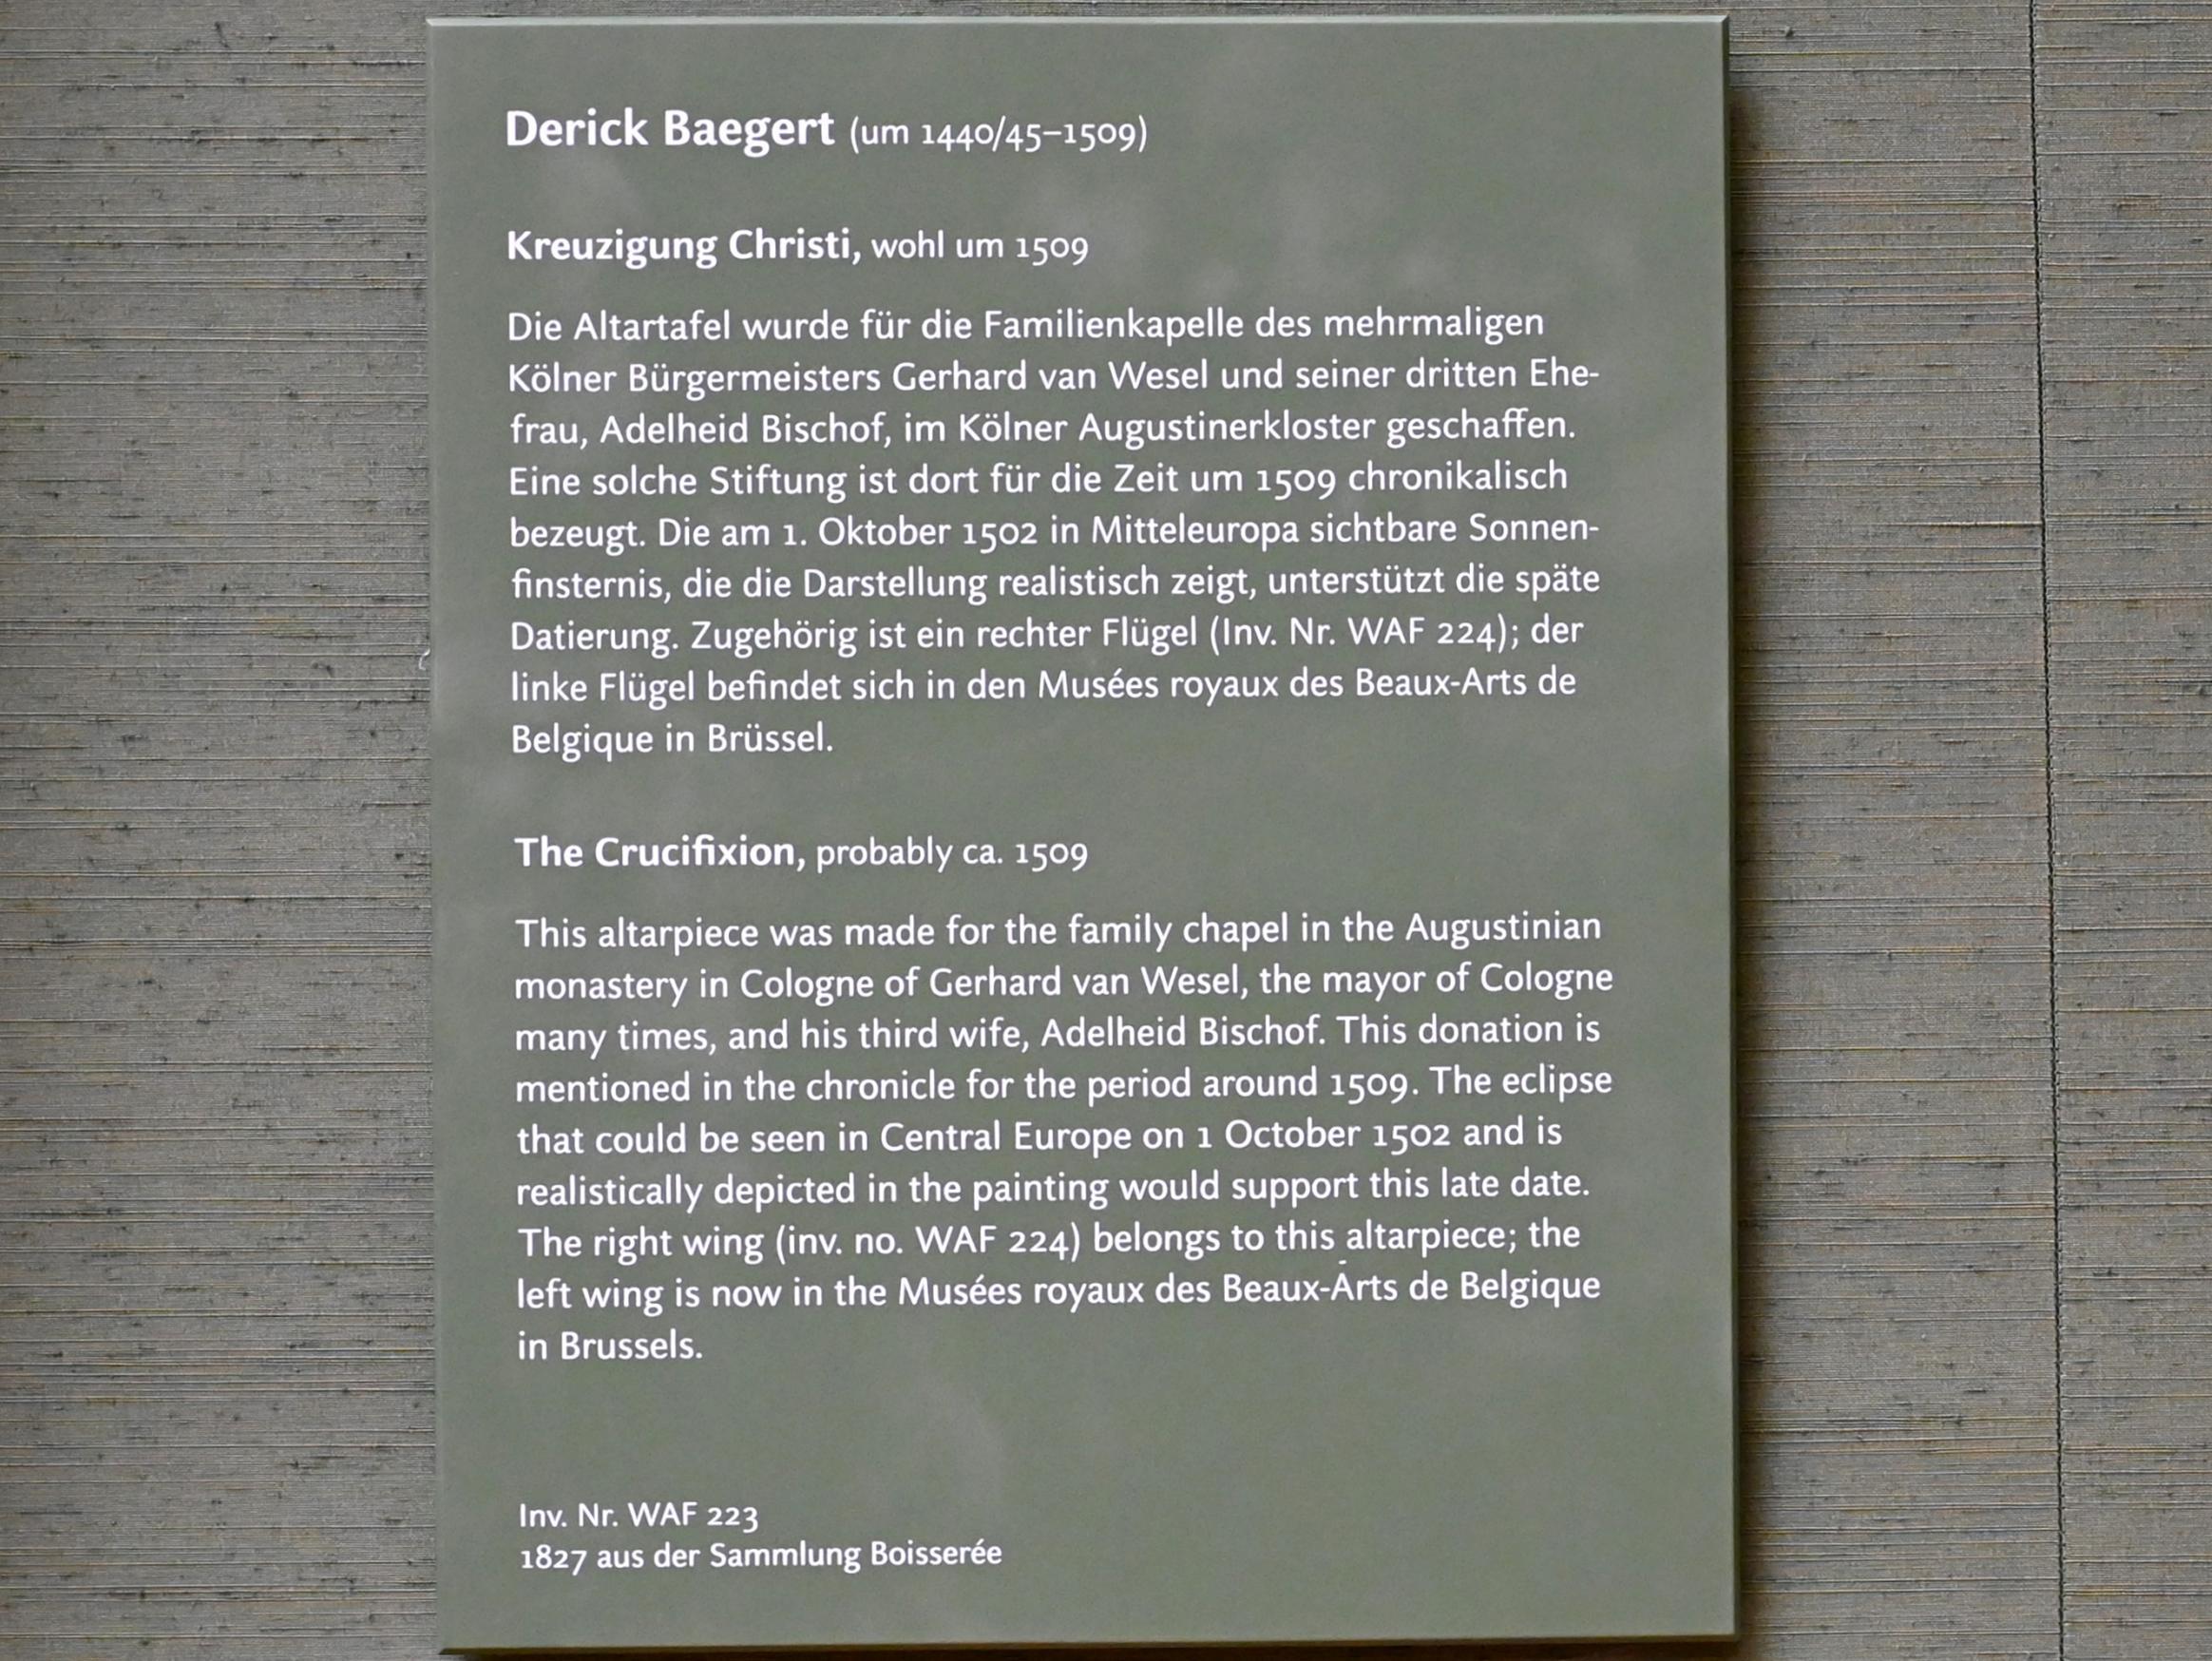 Derick Baegert: Kreuzigung Christi, um 1509, Bild 2/2